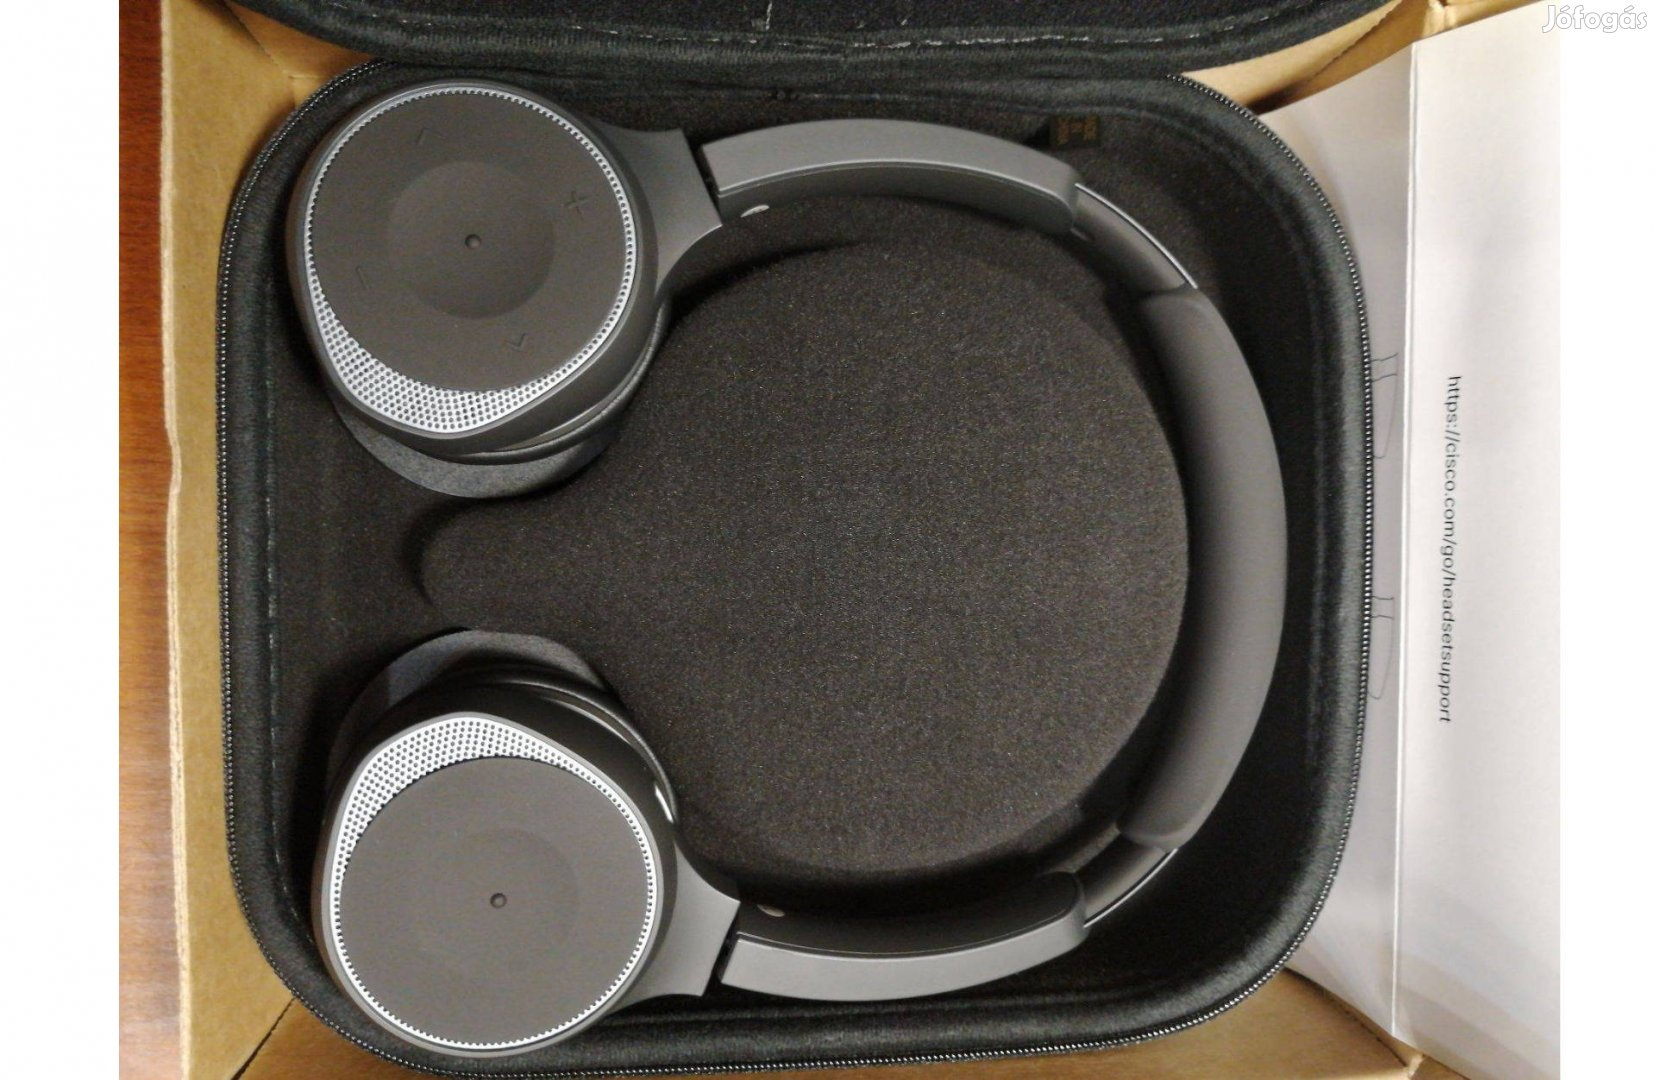 Cisco 730 Bluetooth fejhallgató